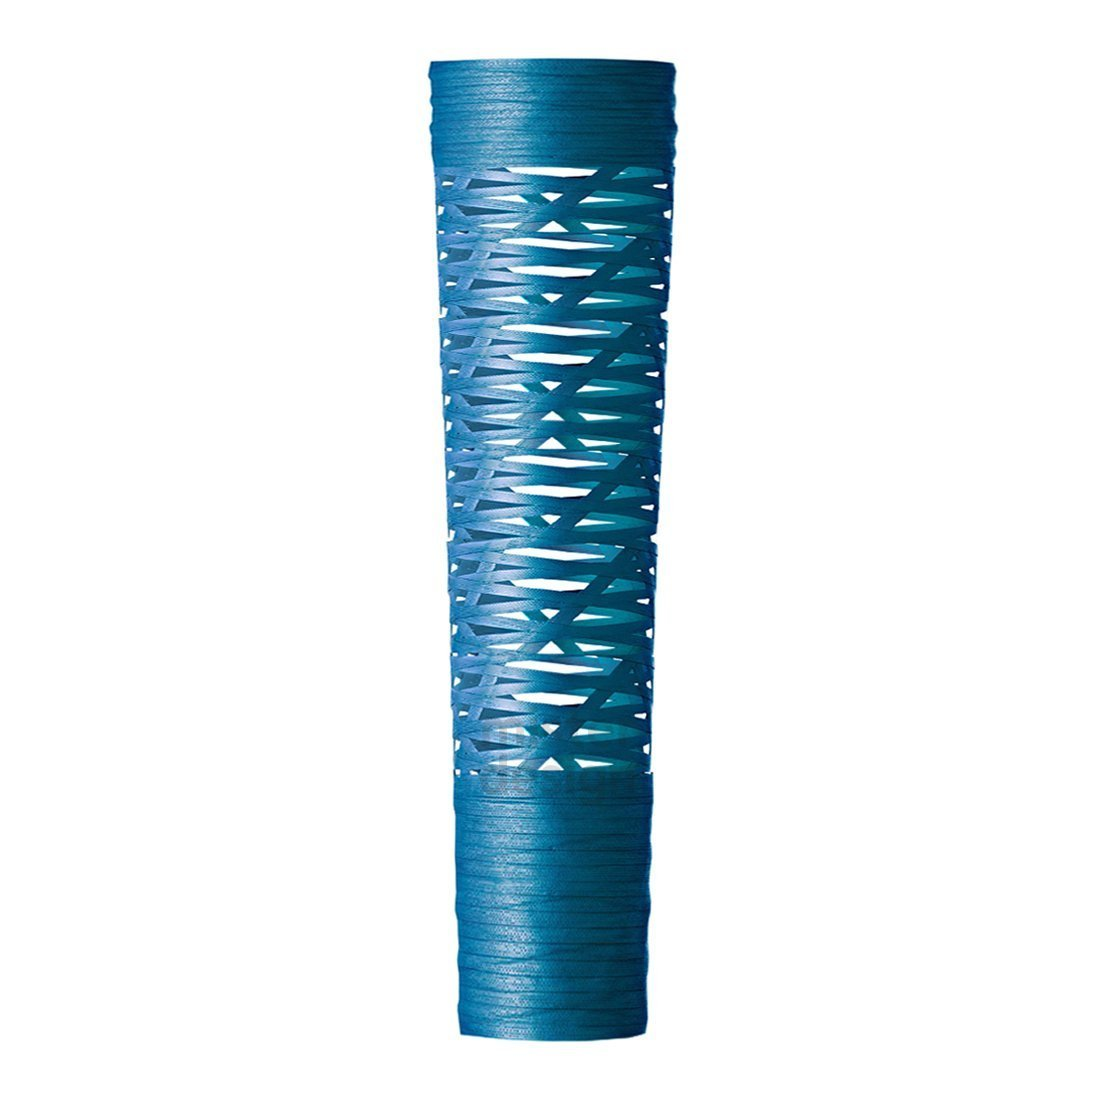 Foscarini Tress Media Vloerlamp Blauw